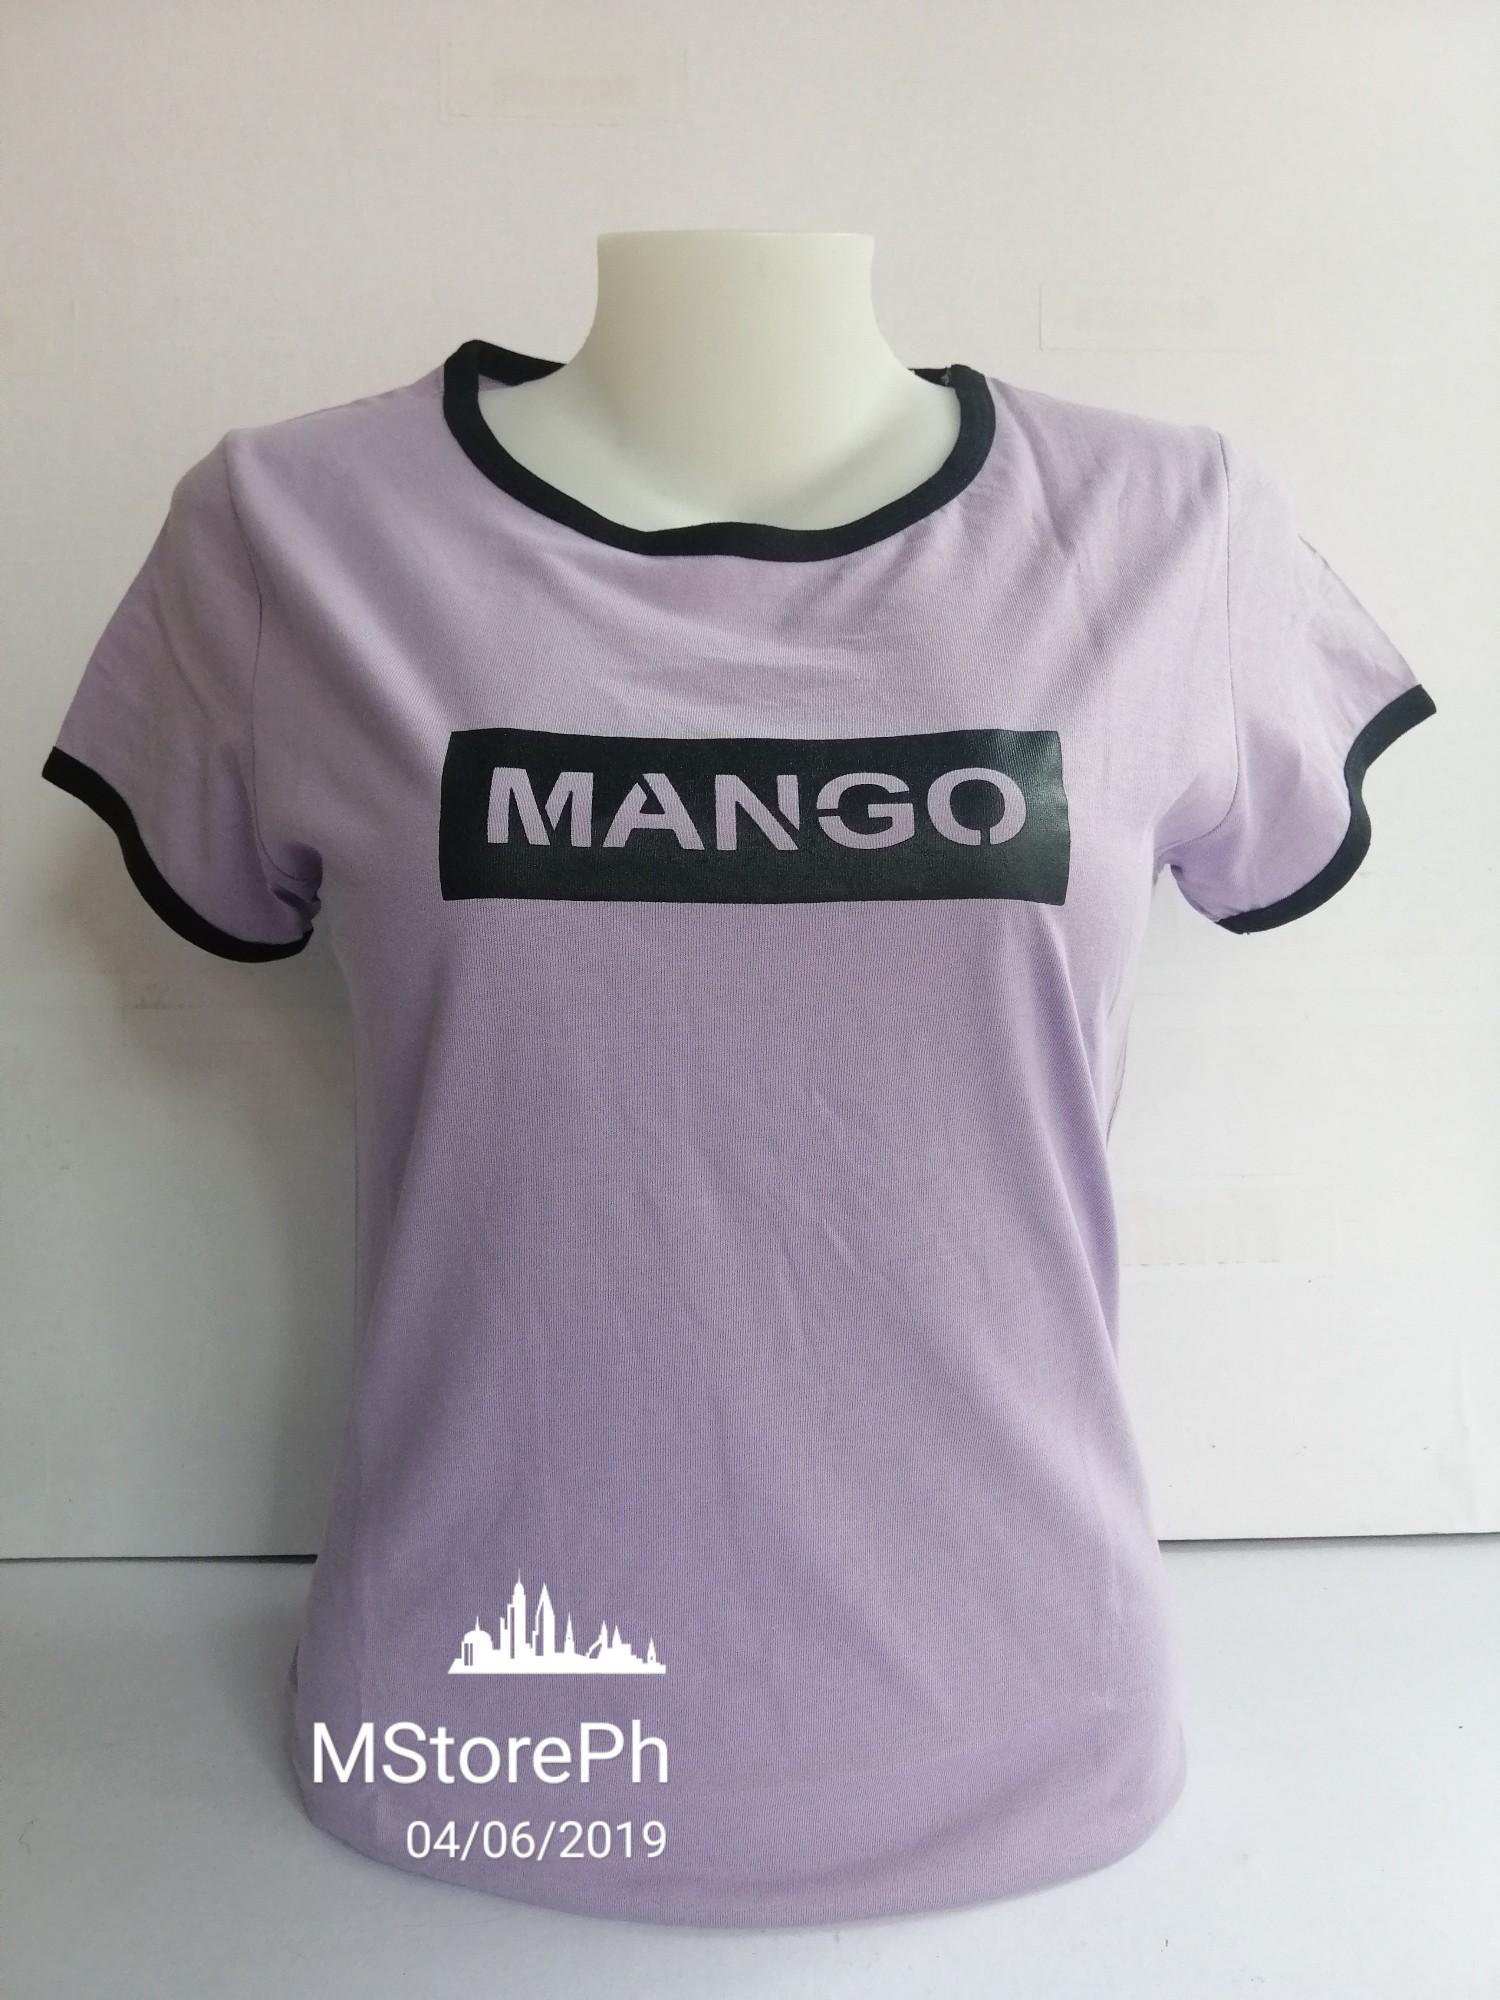 4a3328ae436 Mango Philippines: Mango price list - Mango Satchel, Tote Bag ...